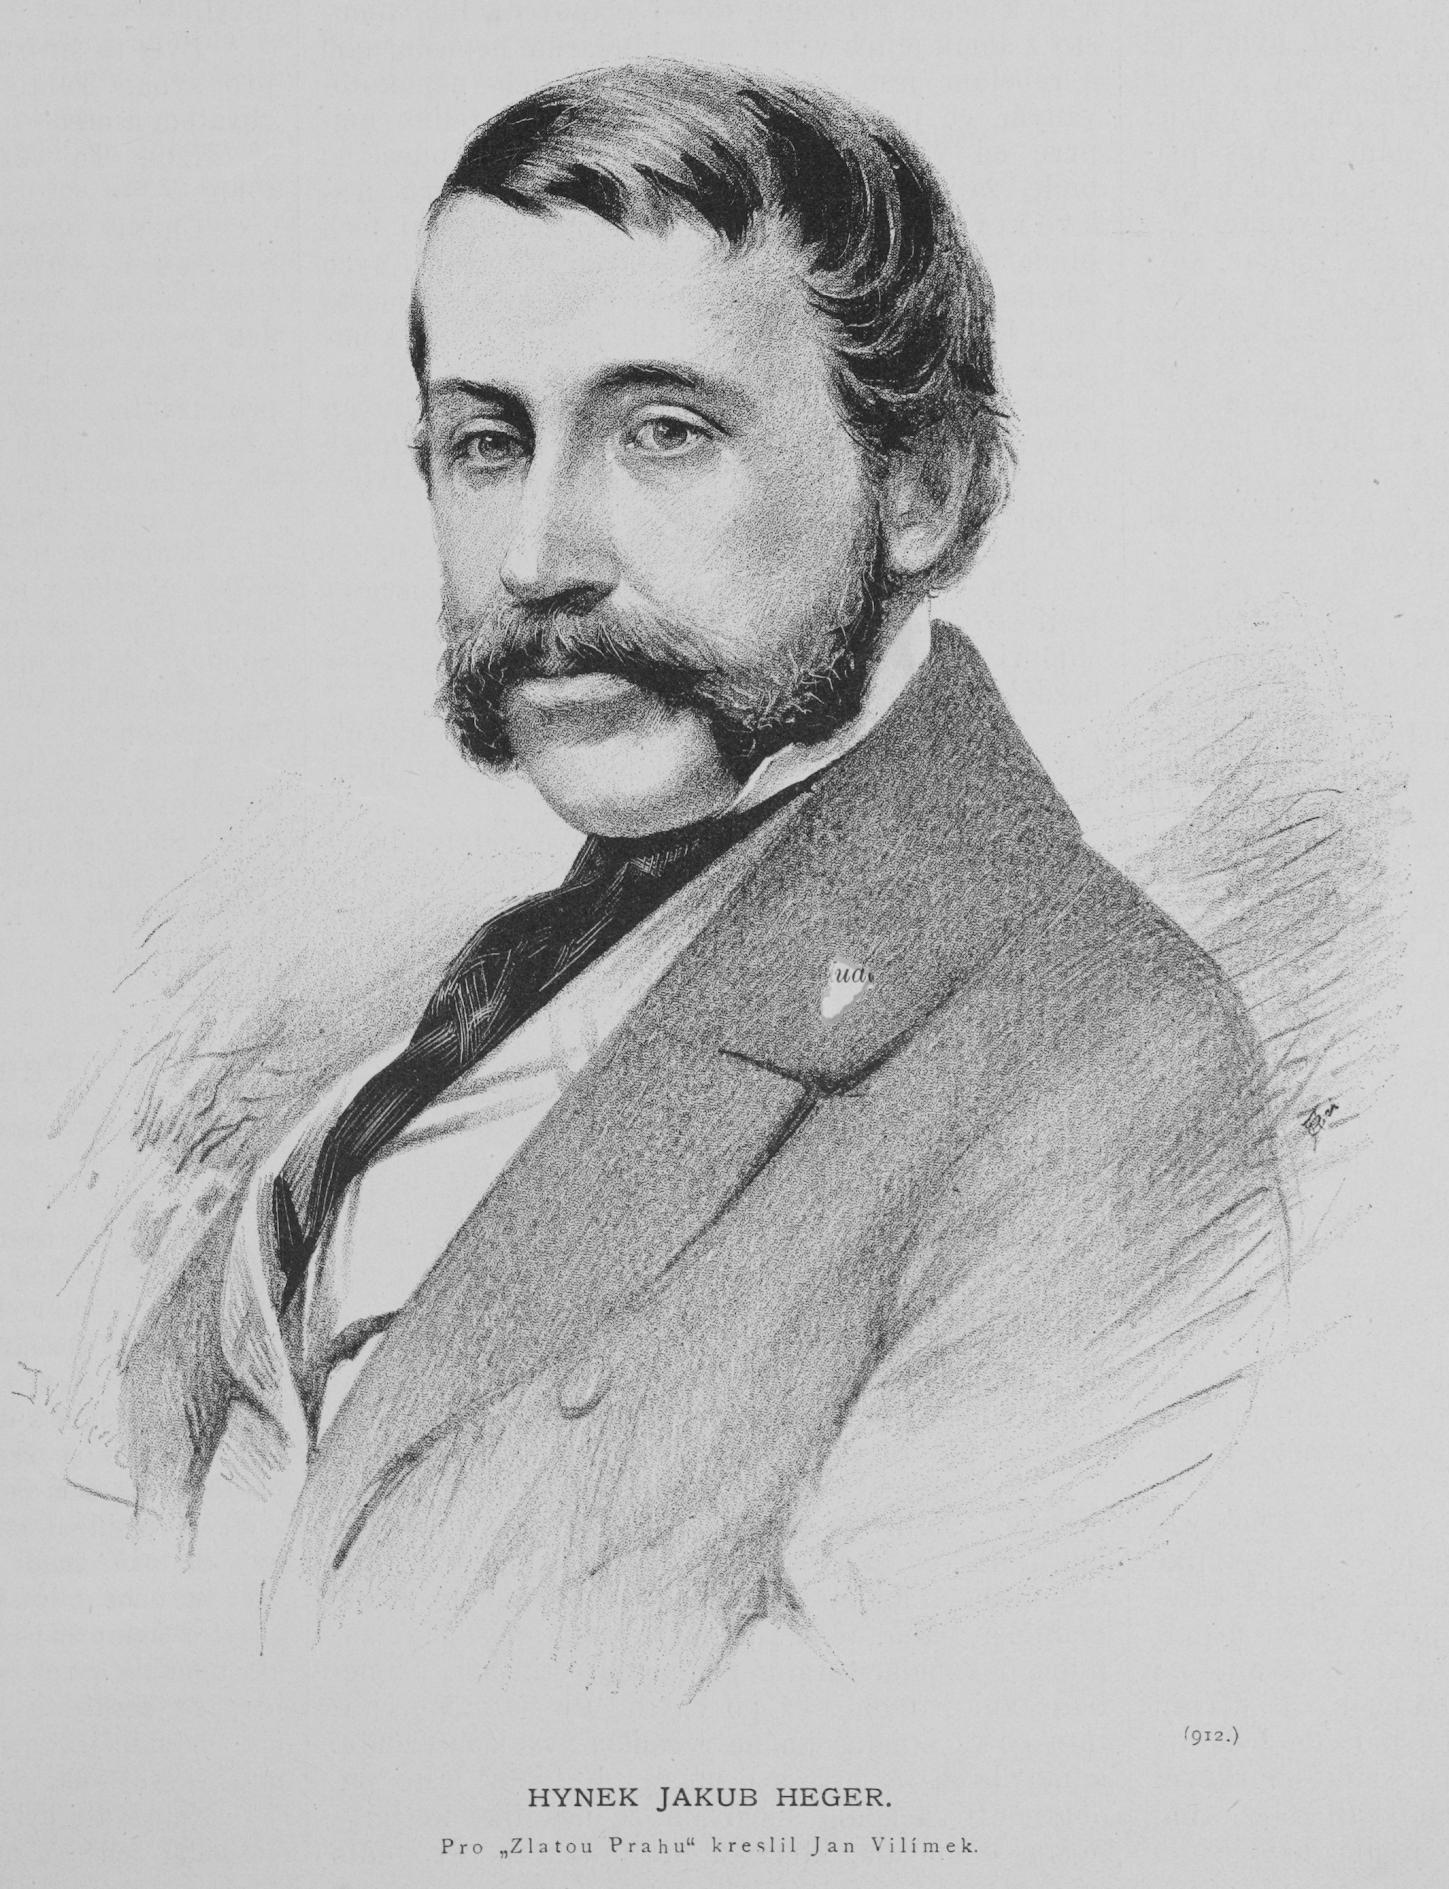 Ignacy Jakub Heger